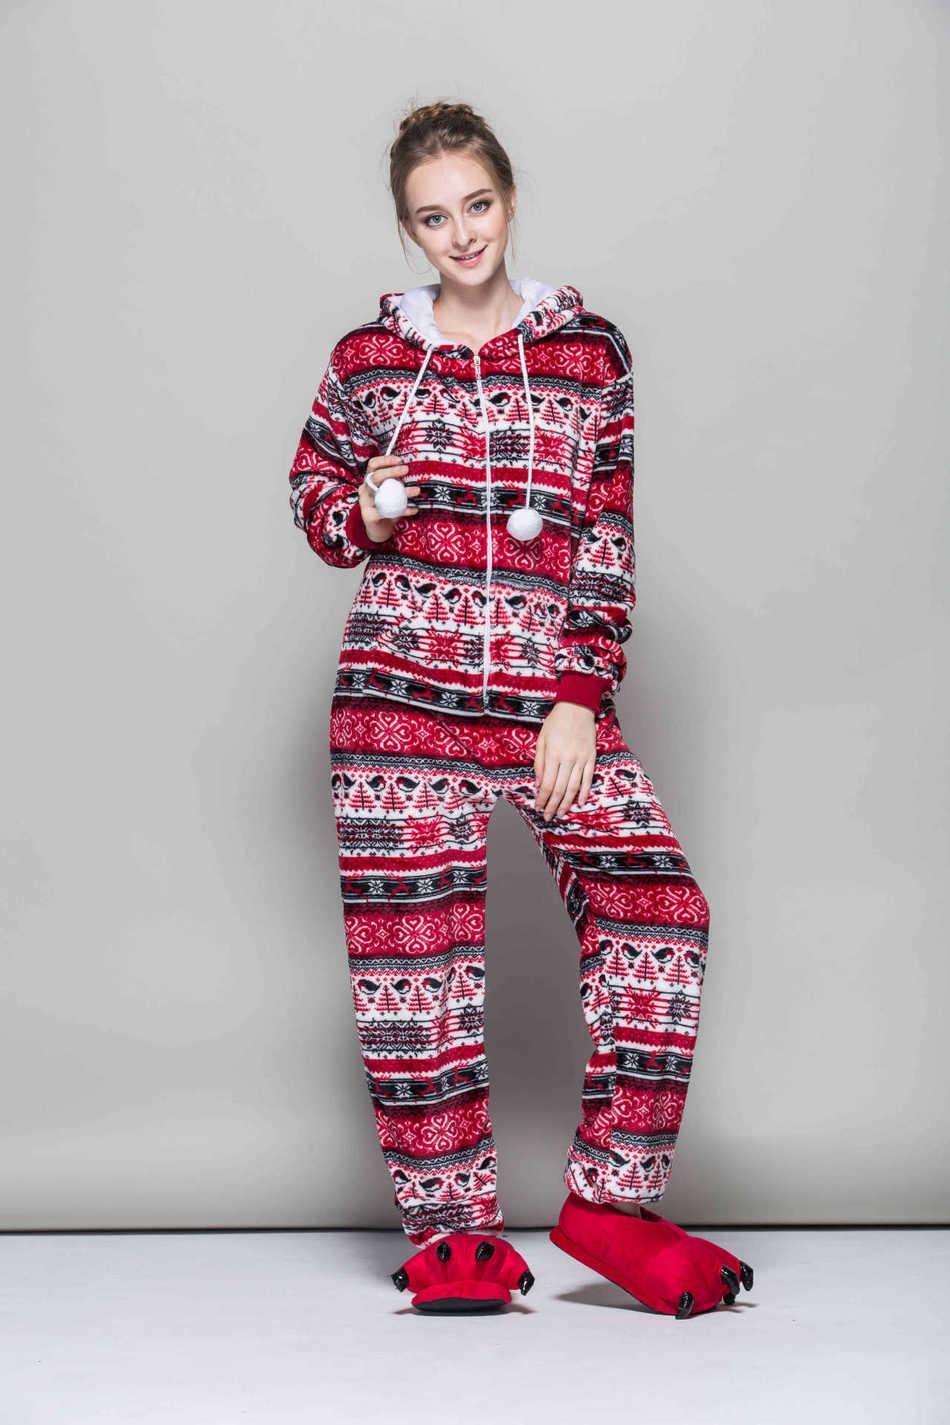 017e341983 New Fashion Cartoon Pyjama Women Flannel Adult Hooded Animal Sleepwear  Autumn and Winter Red Bird Onesies Snowflake Pajama Set